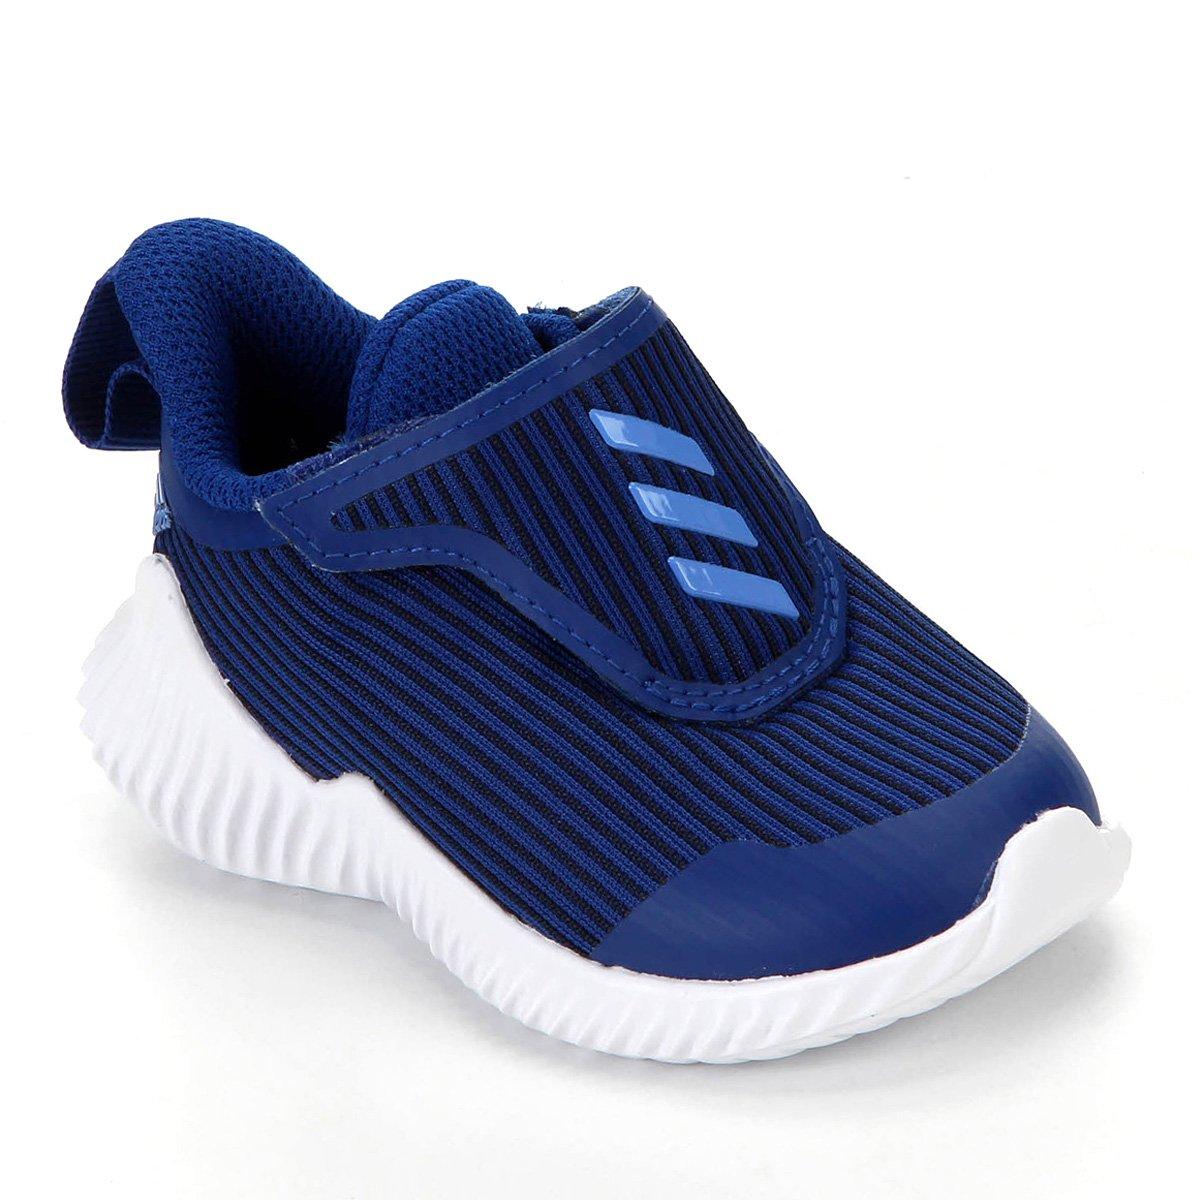 Menor preço em Tênis Infantil Adidas Fortarun Ac - Azul Royal